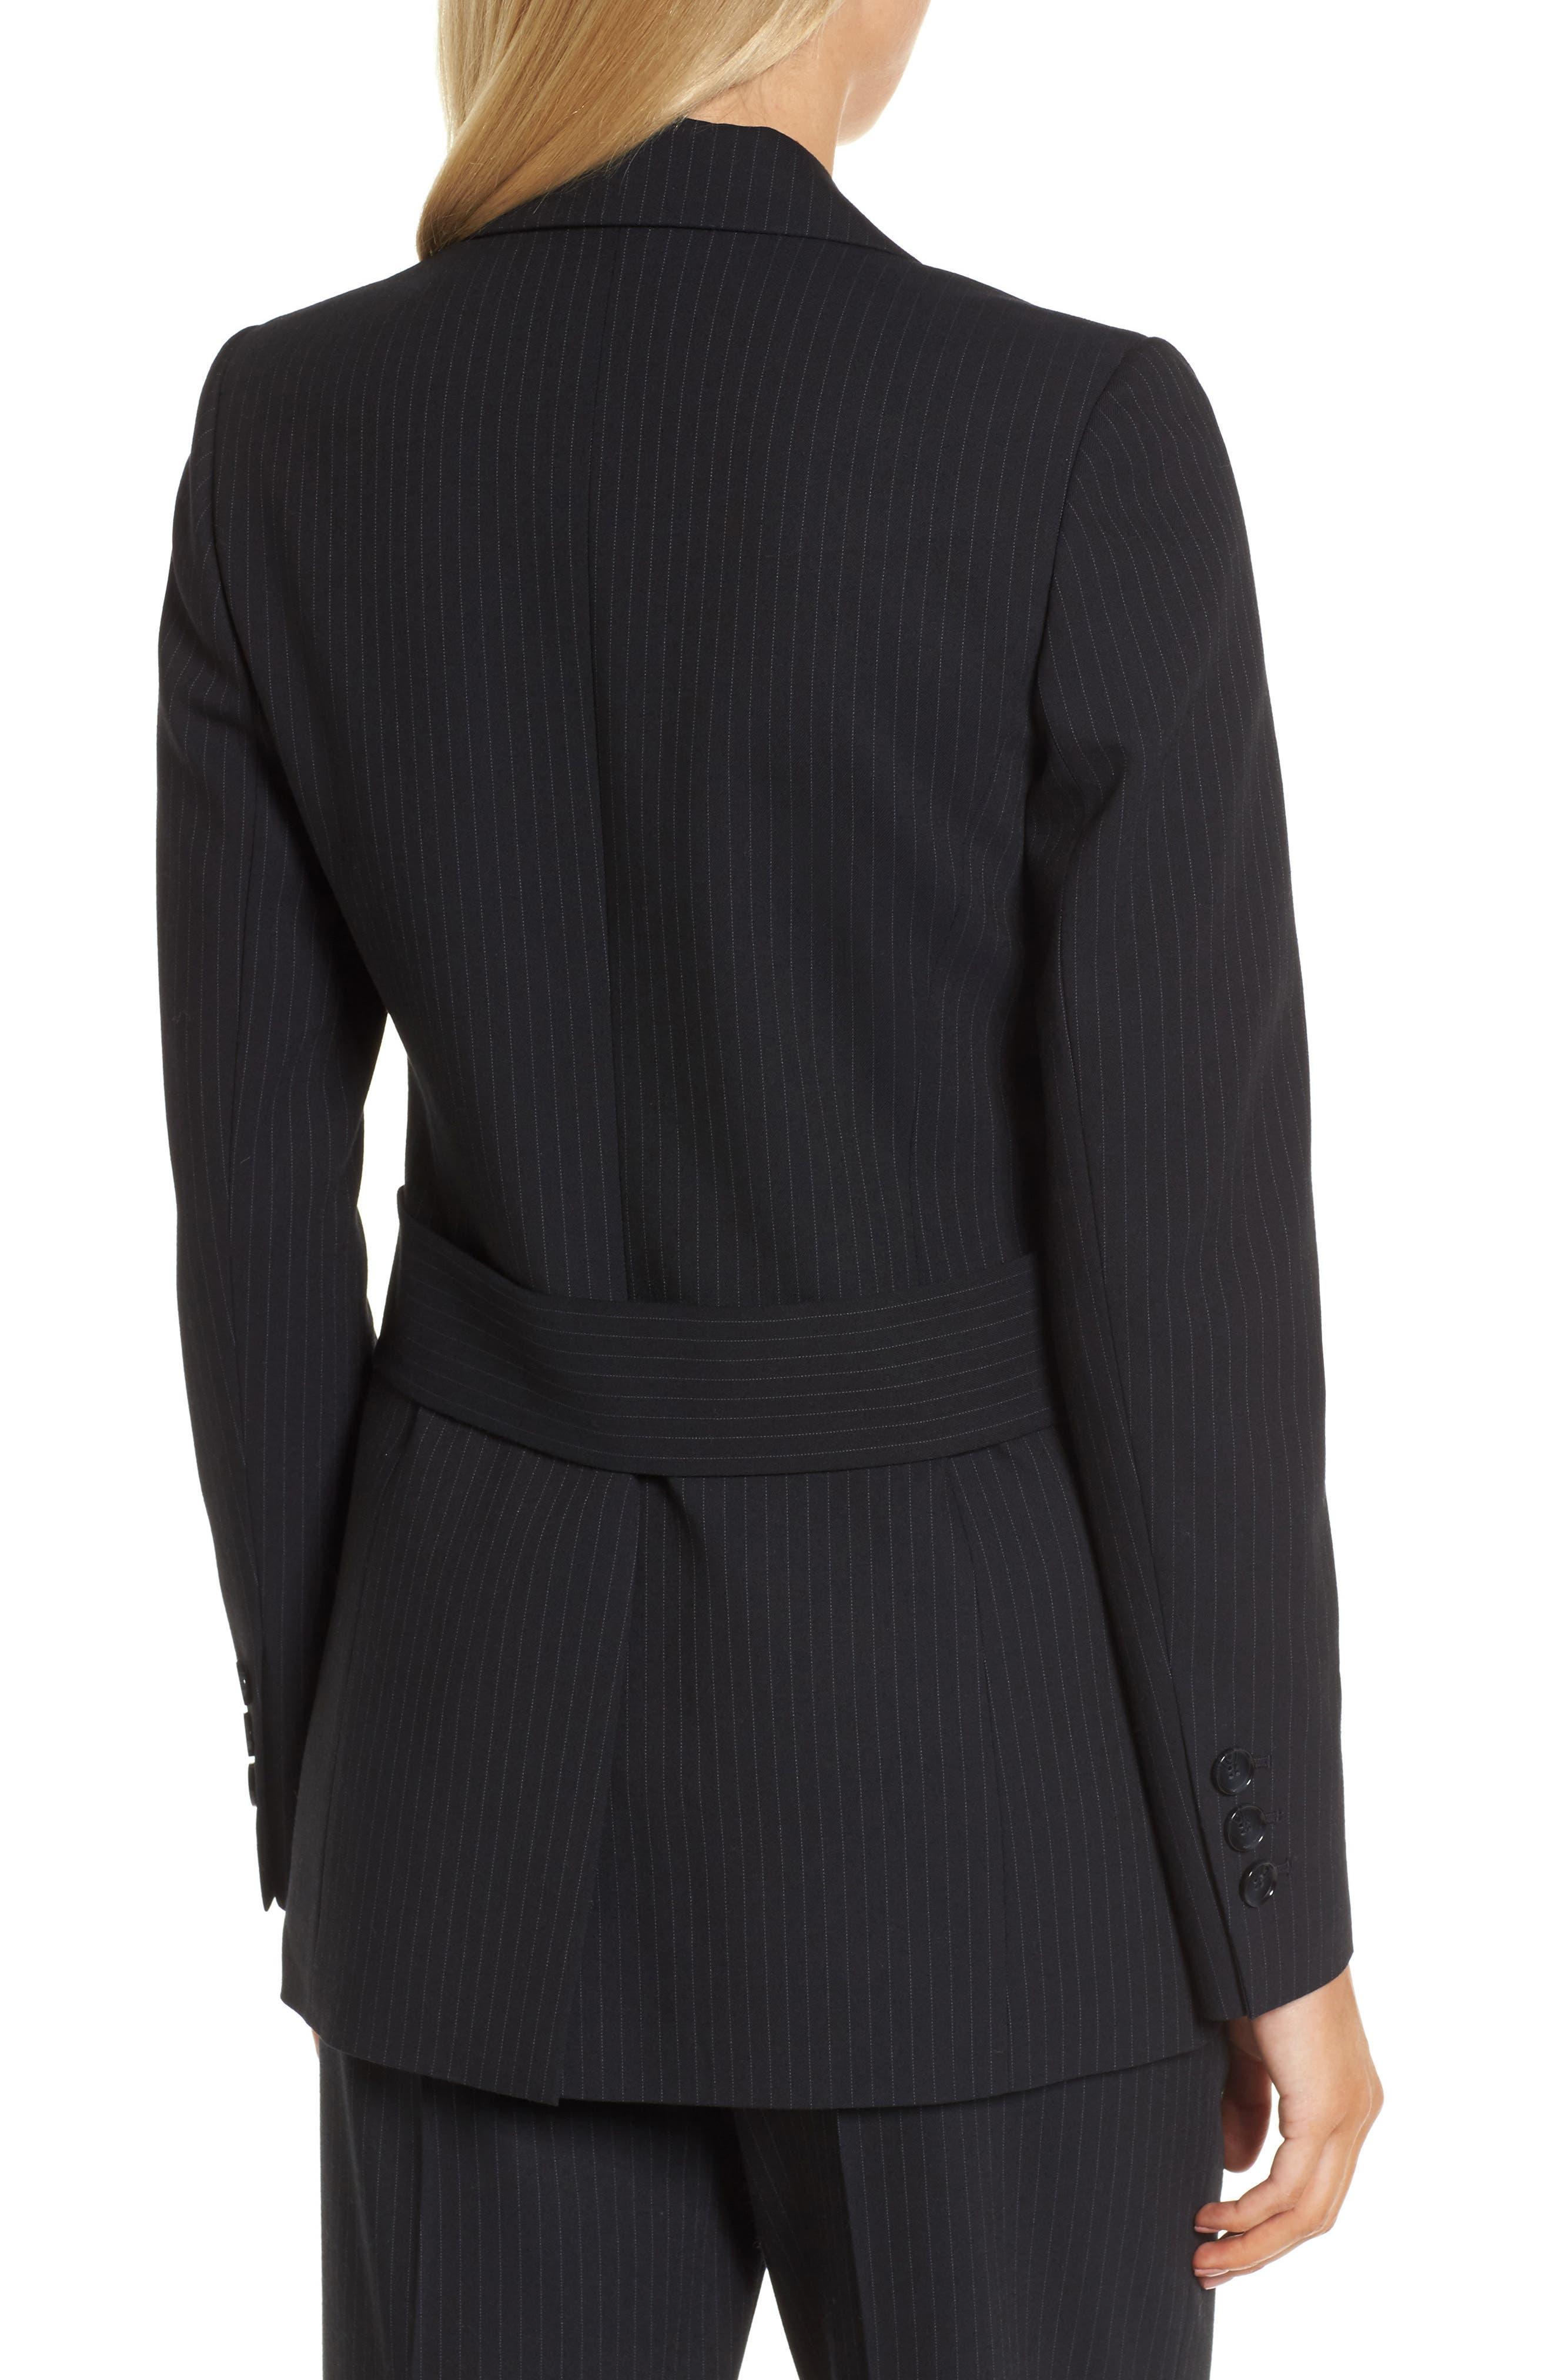 Pinstripe Suit Jacket,                             Alternate thumbnail 3, color,                             Navy Night Pinstripe